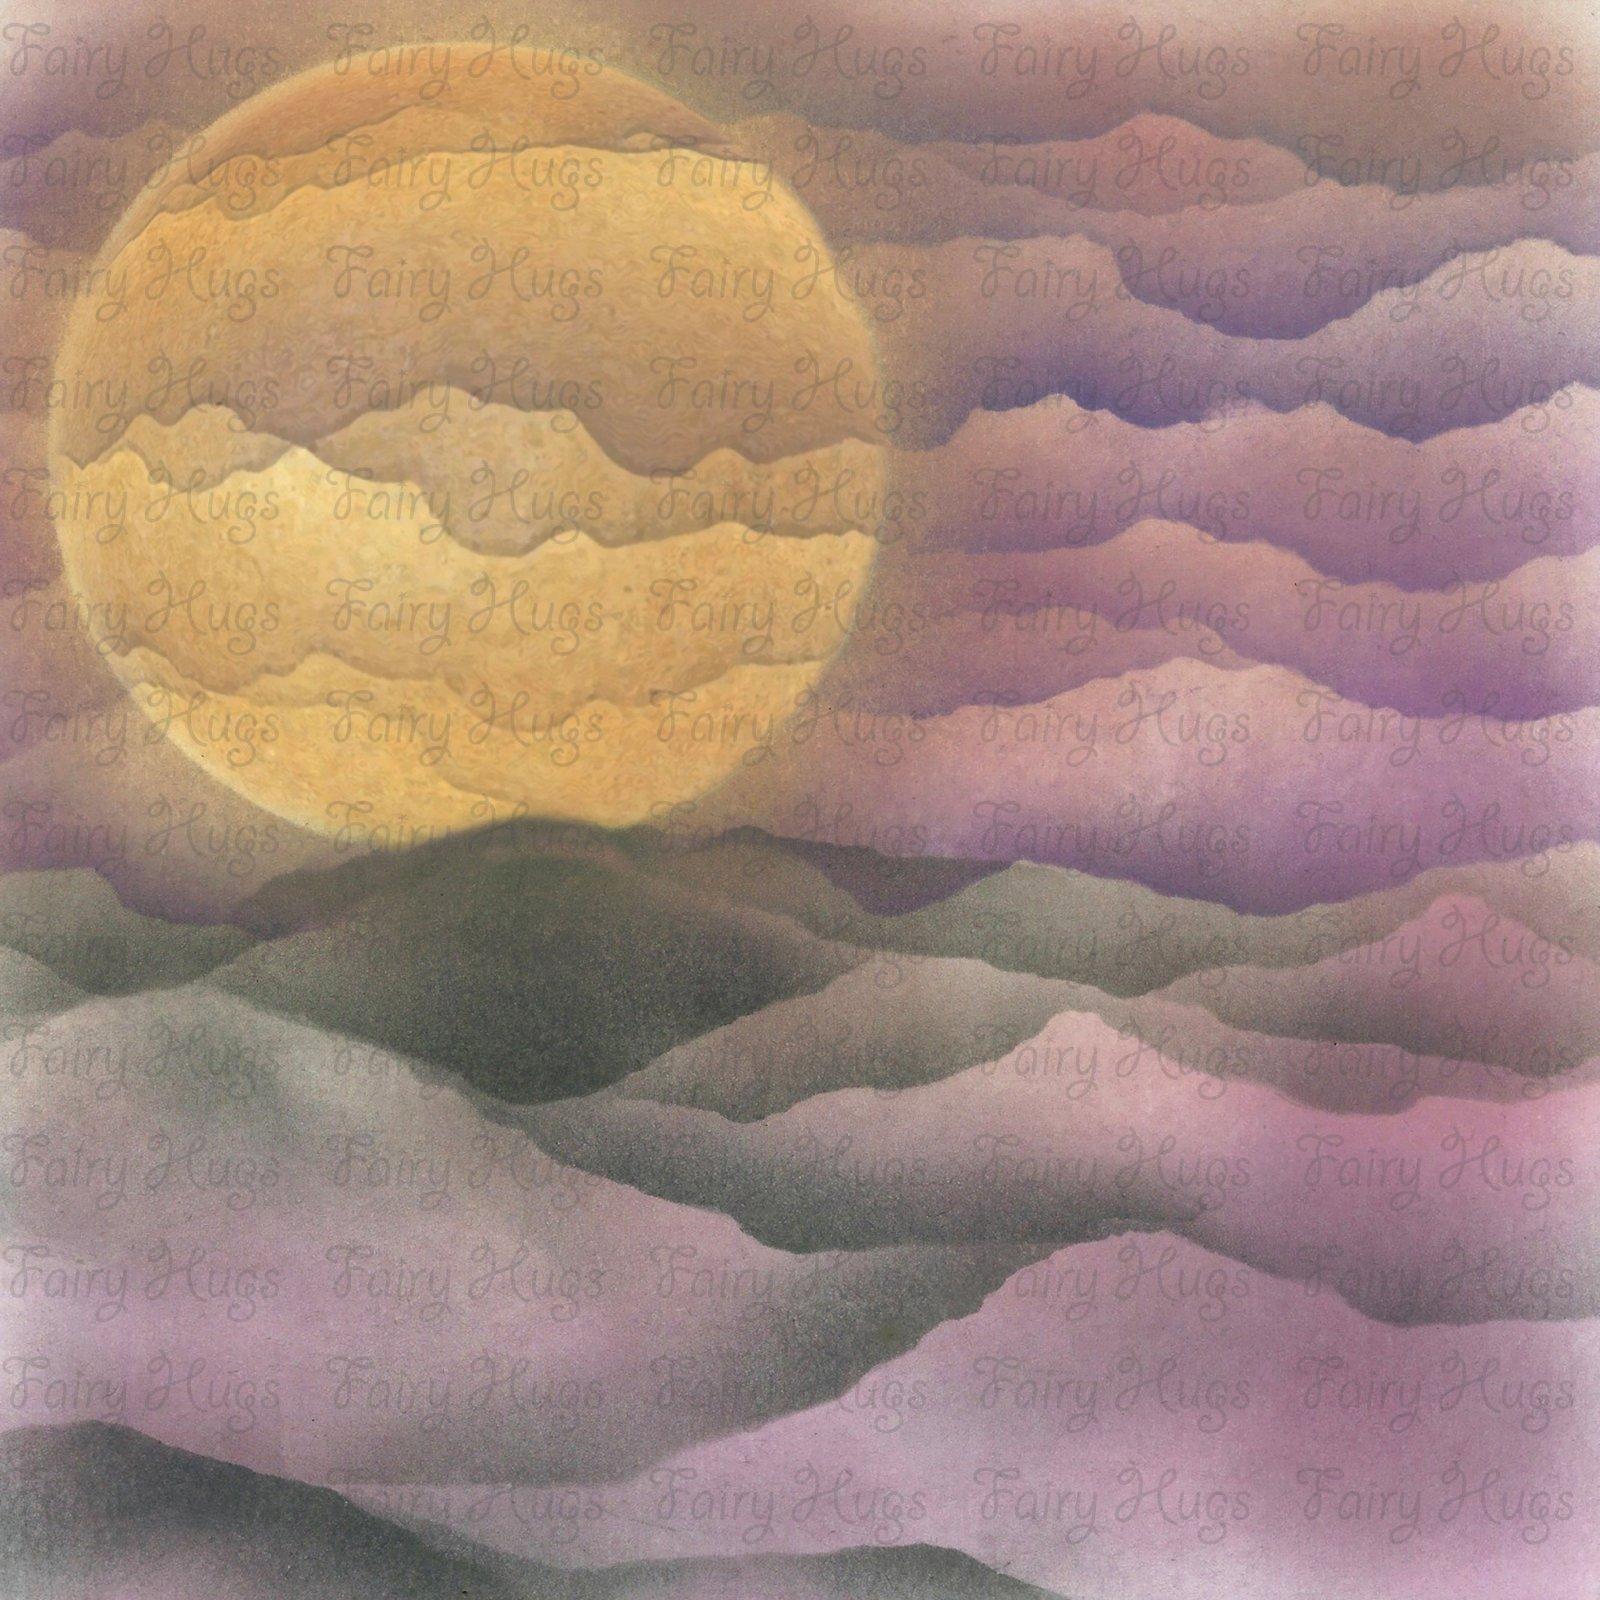 PRE ORDER Fairy Hugs - Fairy-Scapes - 6 x 6 - Purple Glow Sphere